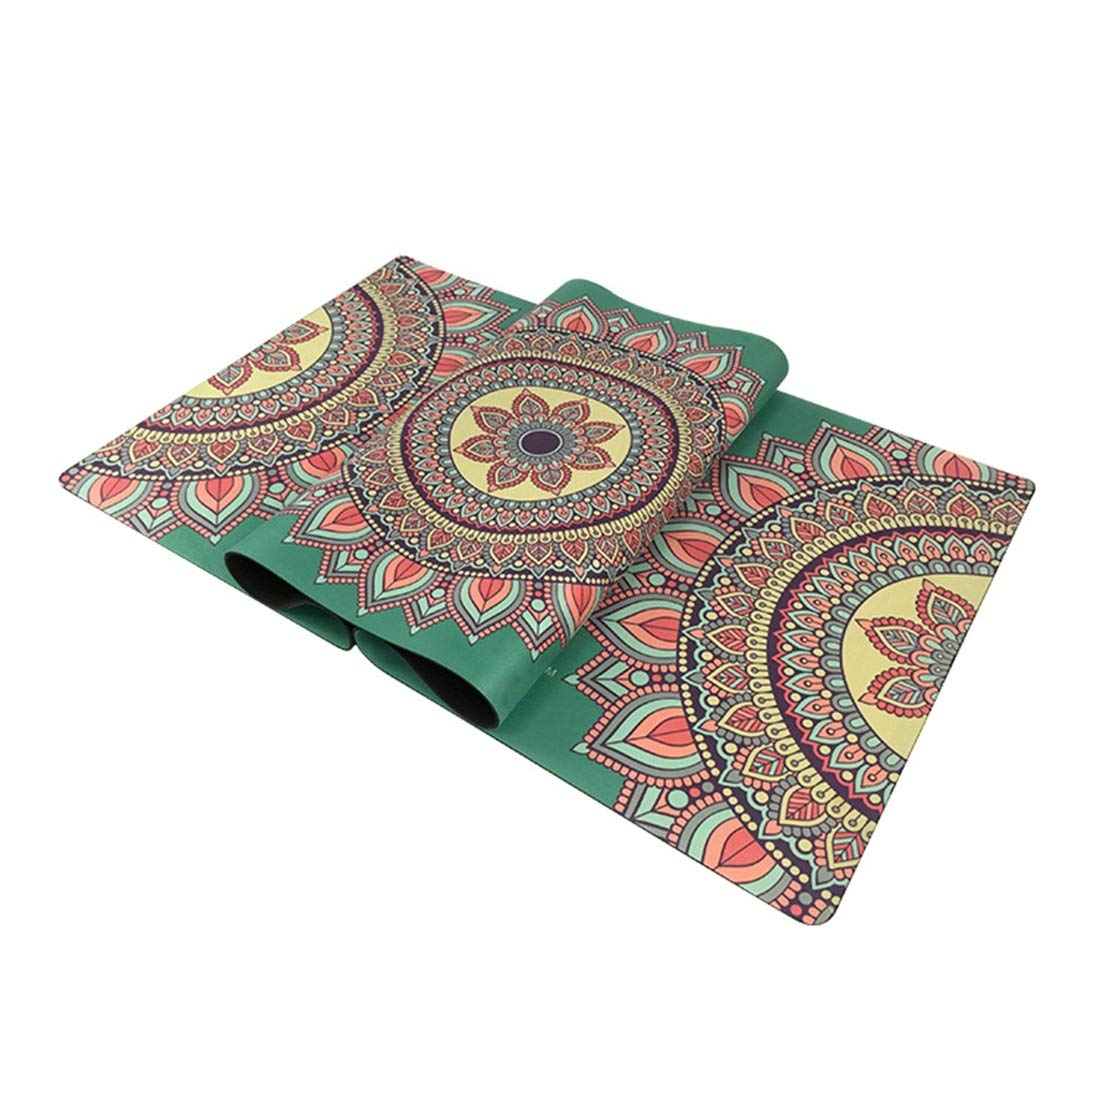 Tatkldisu Yogamatte, Gummi, 35 mm, umweltfreundliche Trainingsmatte Yogamatte. (Farbe : Grün)